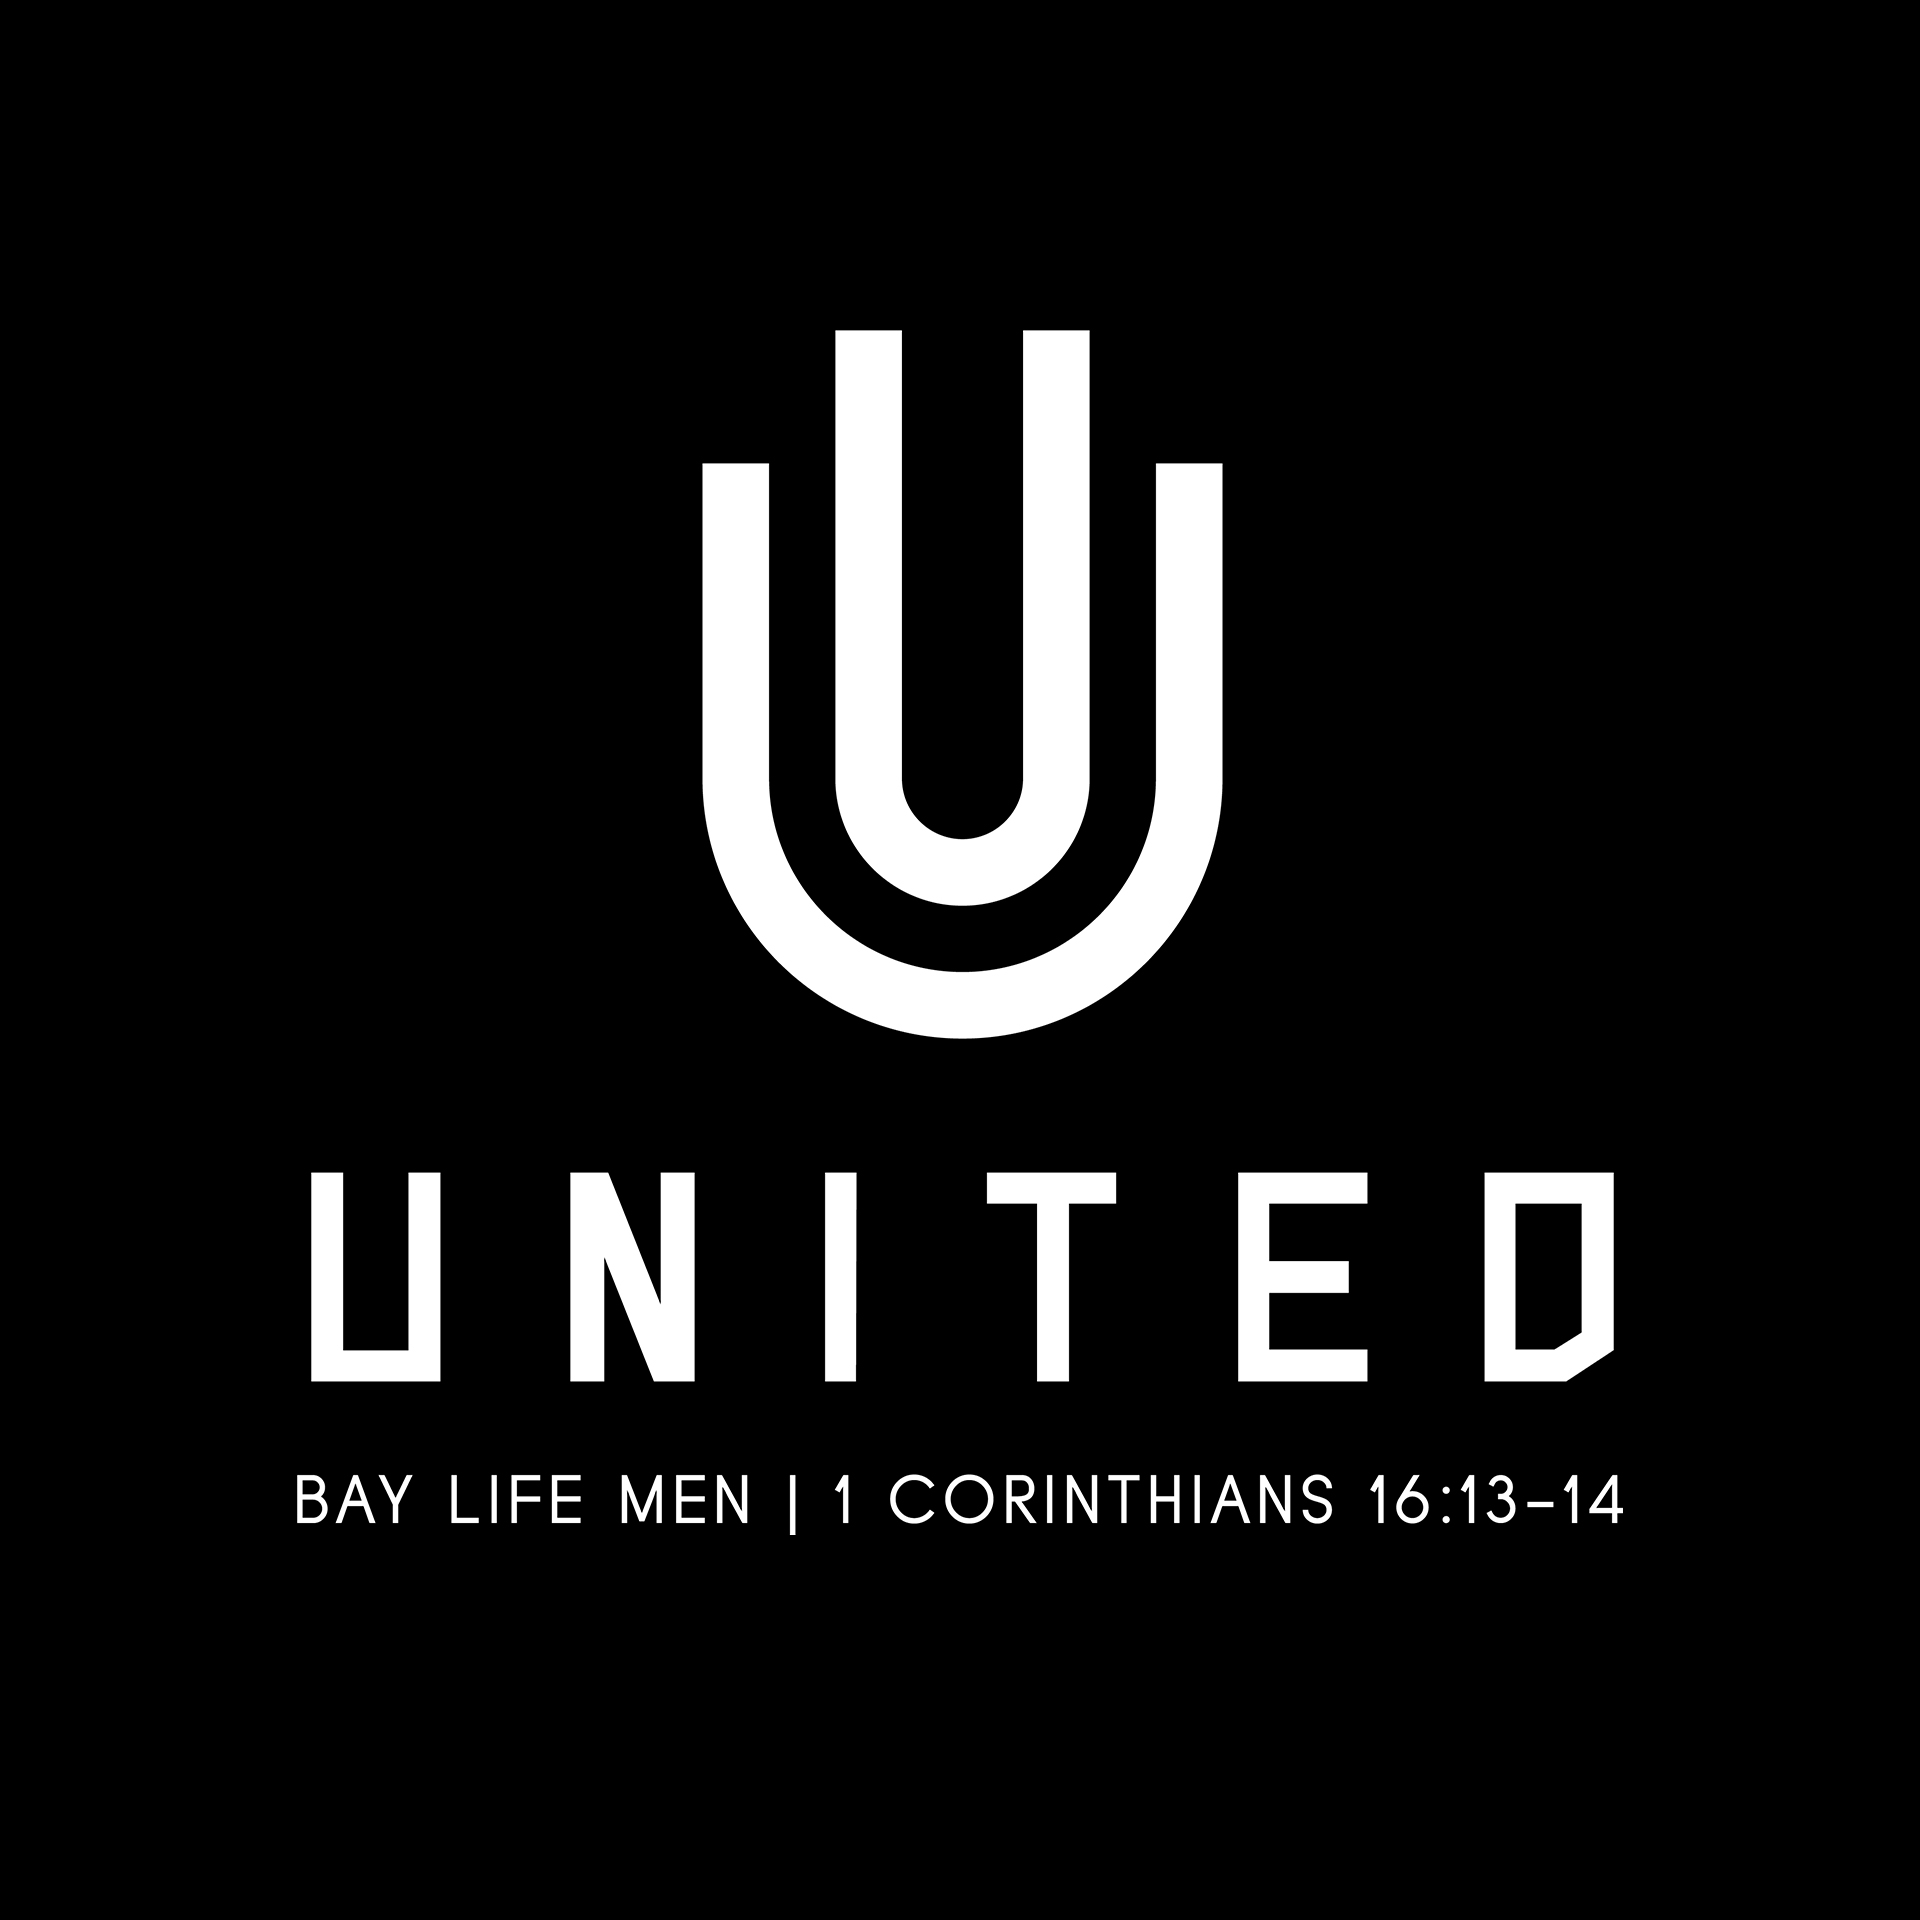 Bay Life Men United | Oct 26 7-9pm | baylife.org/groups